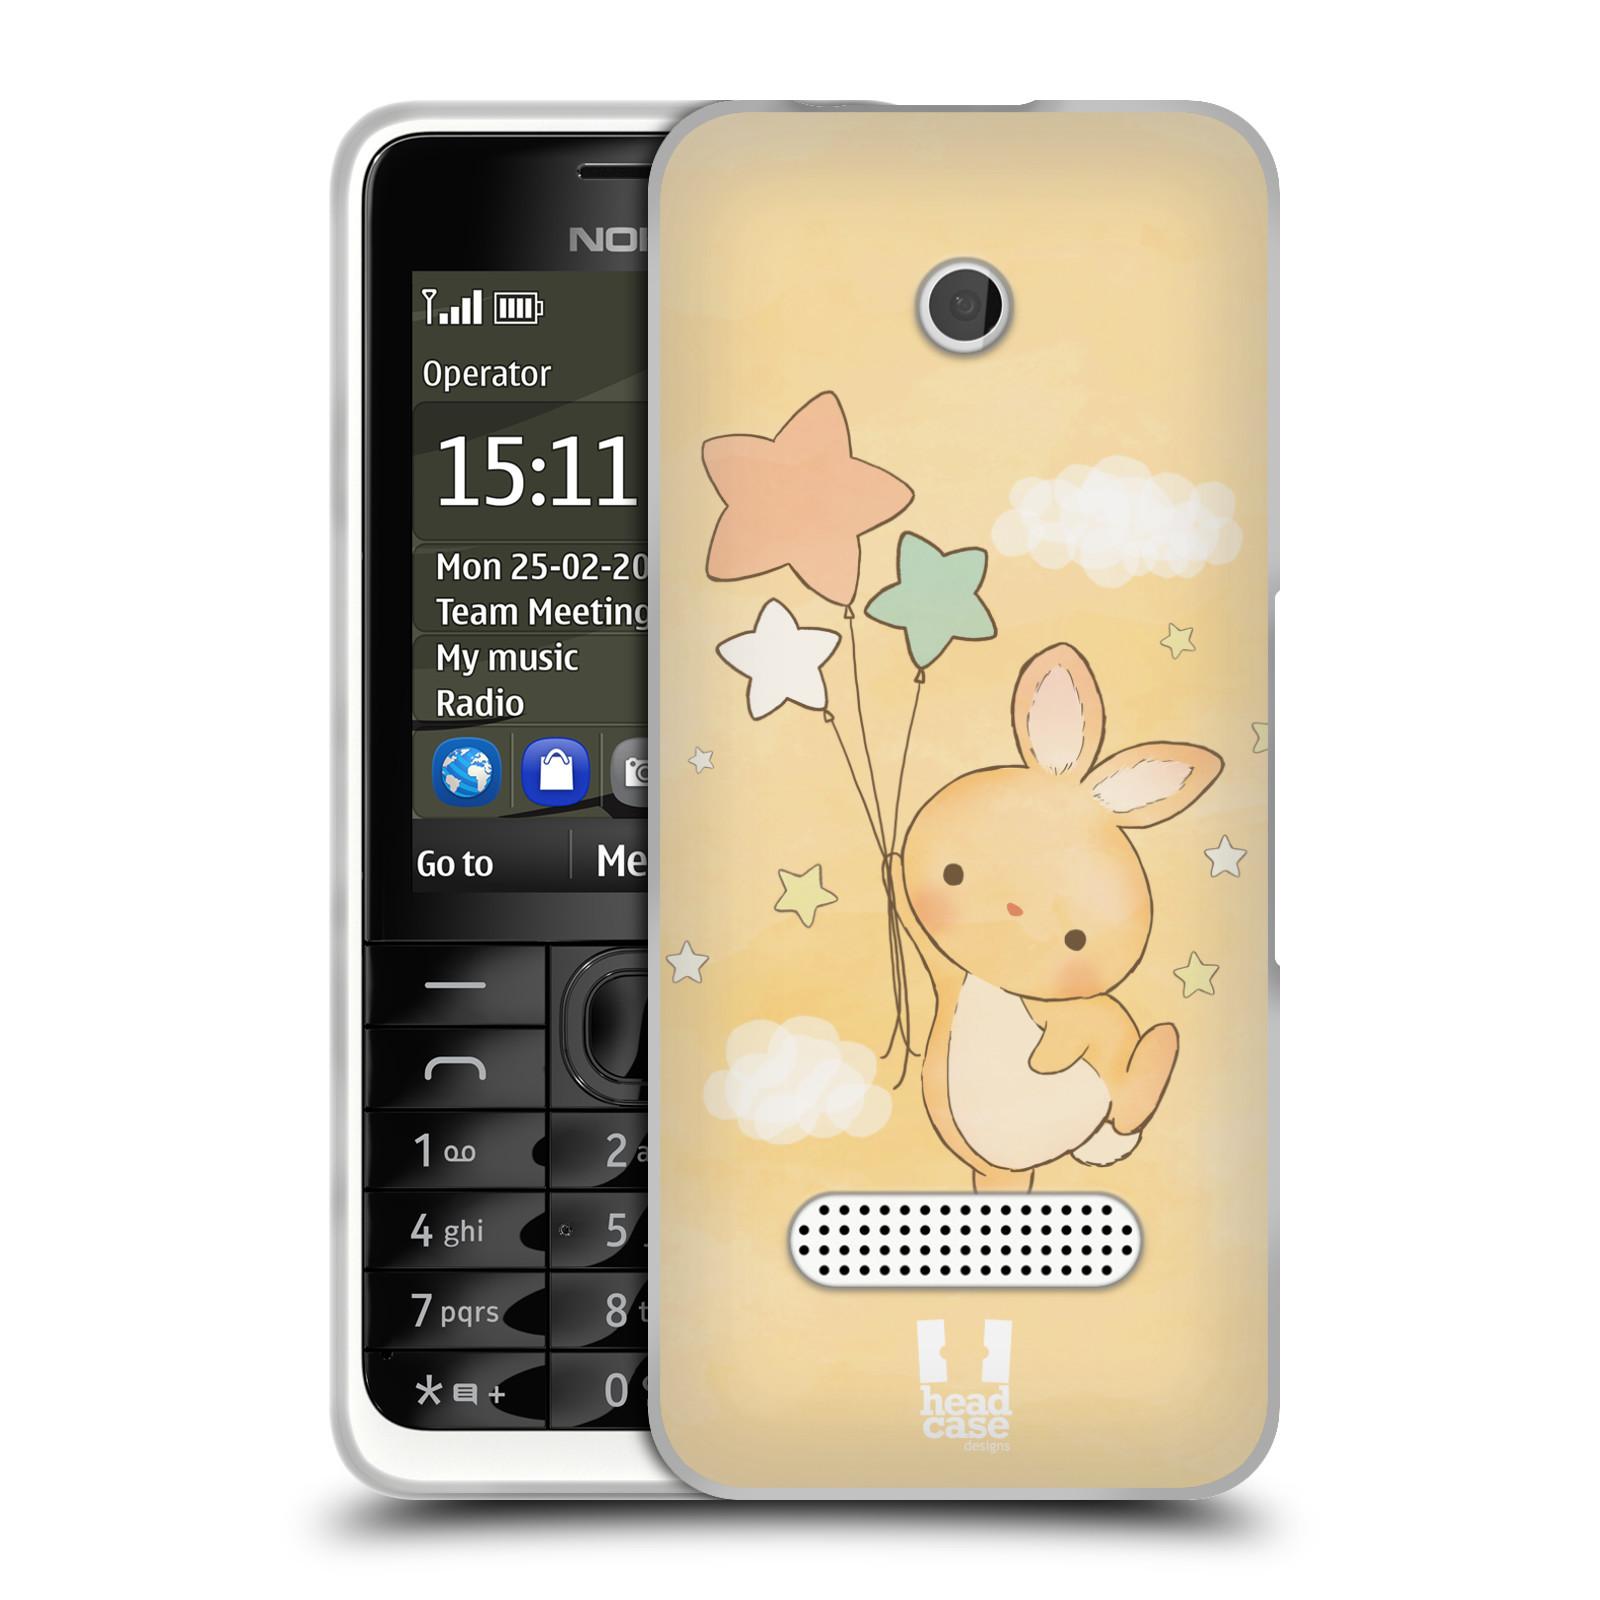 HEAD CASE silikonový obal na mobil NOKIA 301 vzor králíček a hvězdy žlutá